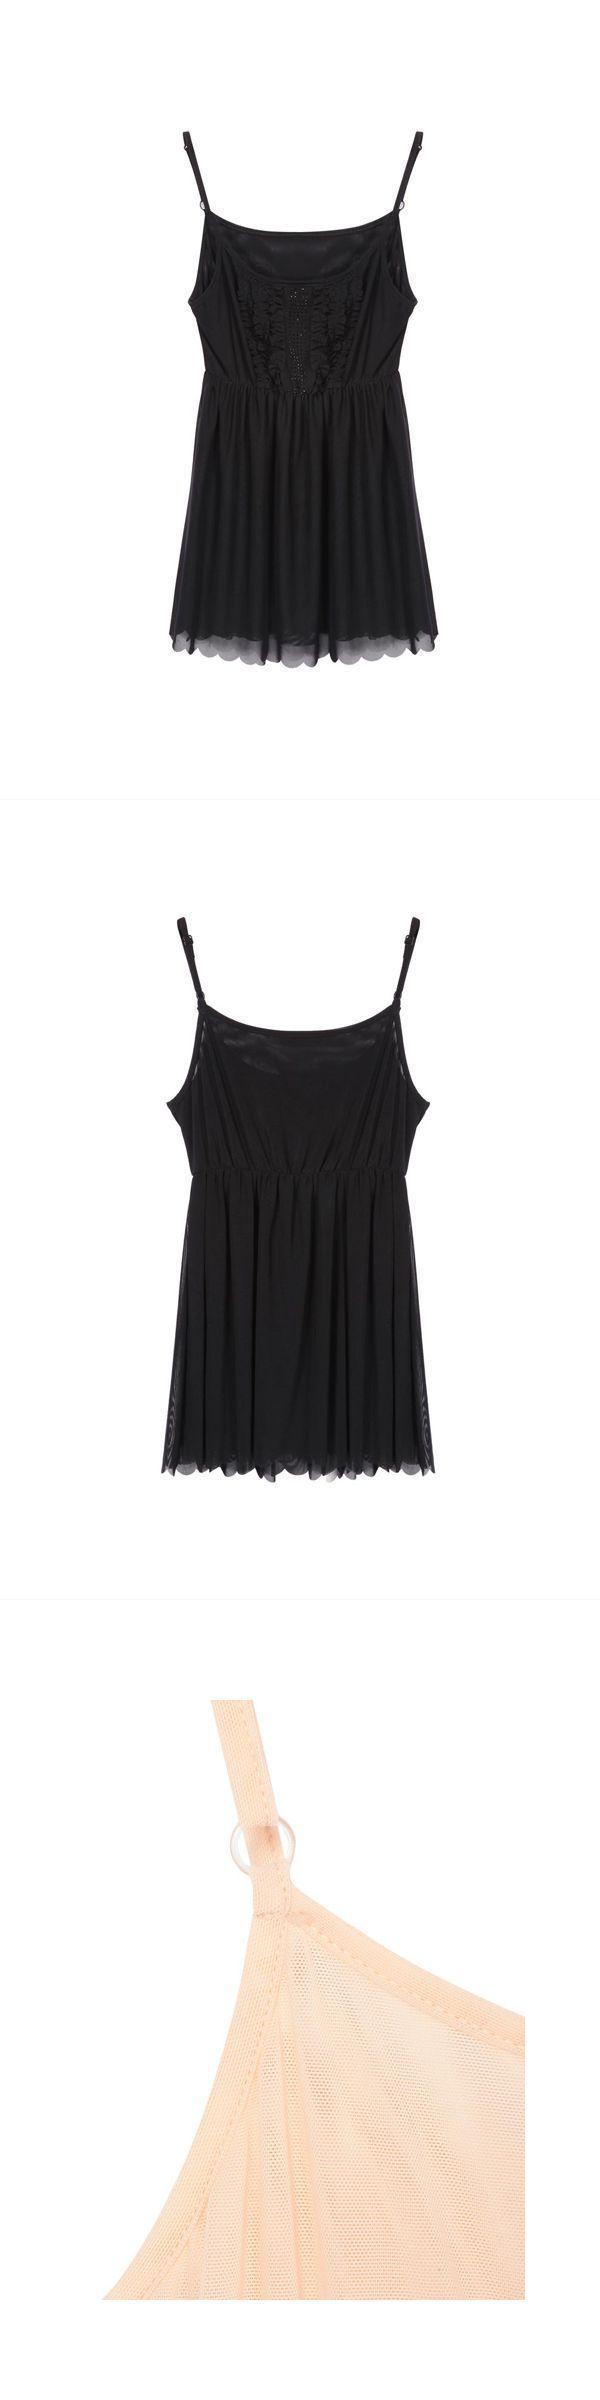 Bouffancy embellished beading sheer mesh apricot black strap vest best fitting women#8217;s tank tops #band #tank #tops #girl #fruit #loom #womens #tank #tops #tank #top #girl #mockup #womens #embellished #tank #tops